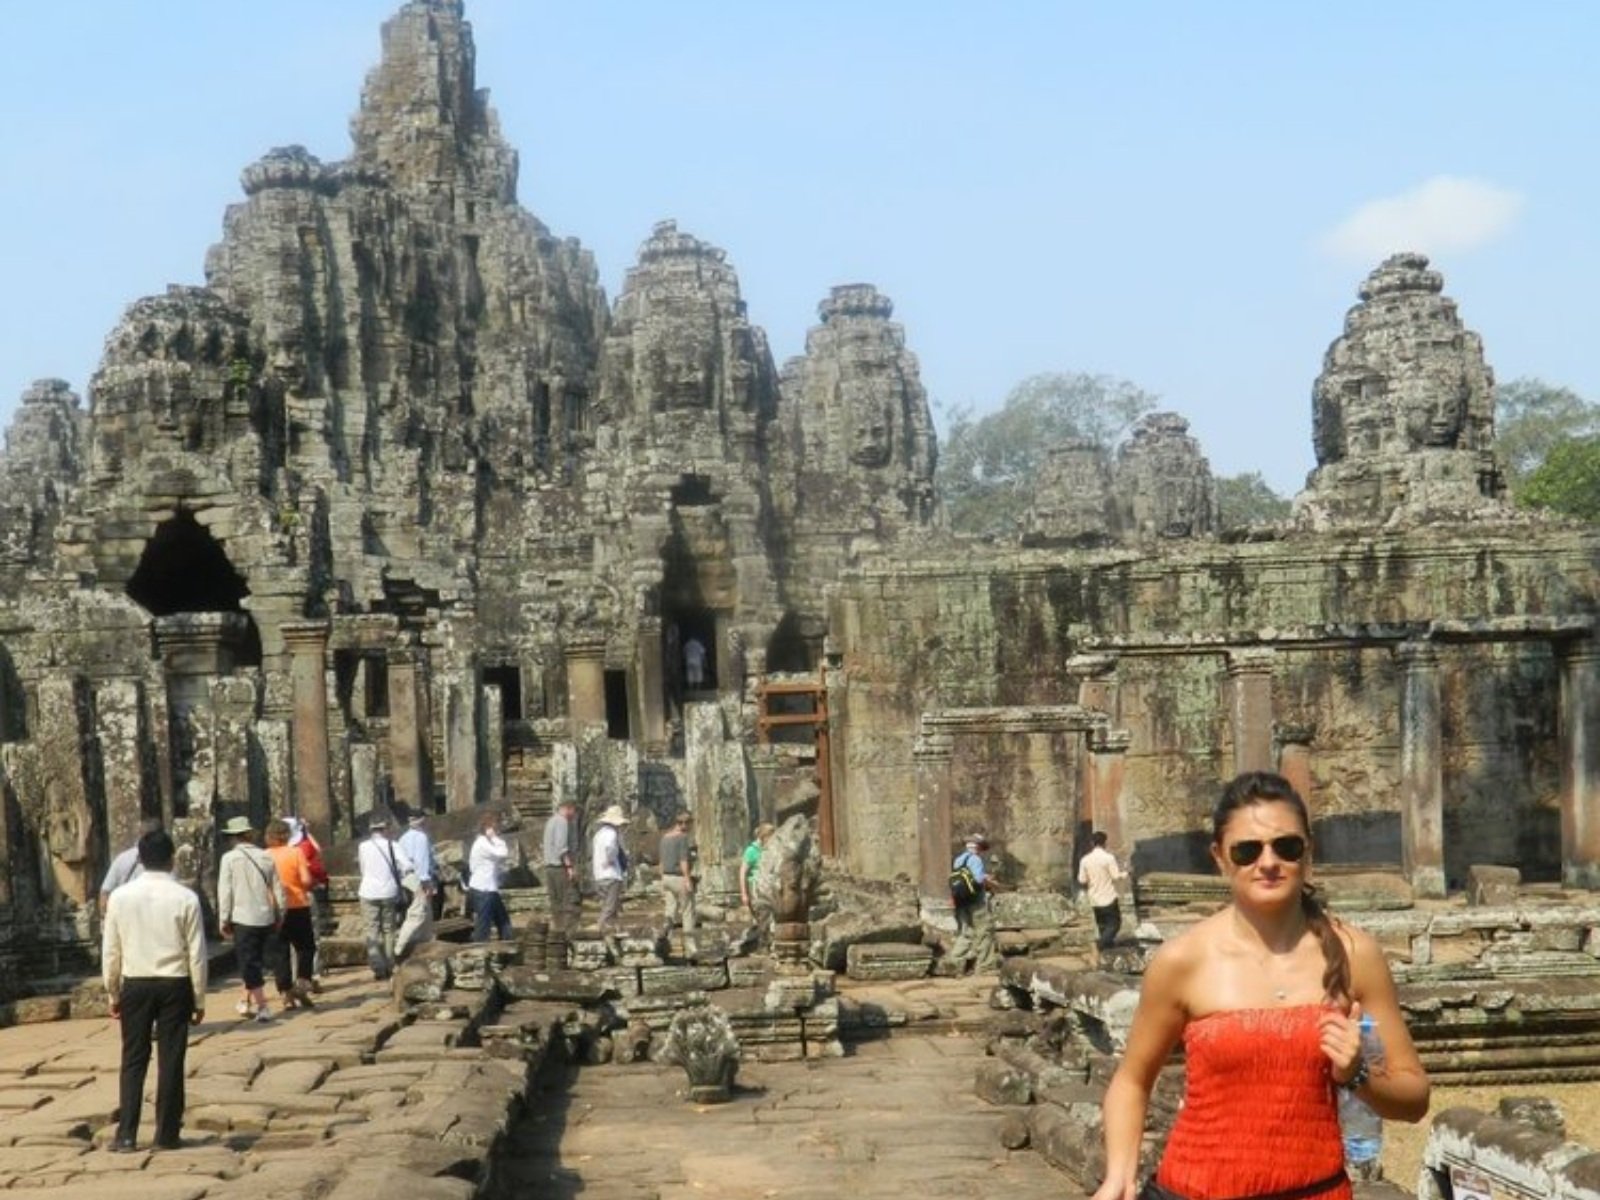 Exploring ancient temples in Cambodia